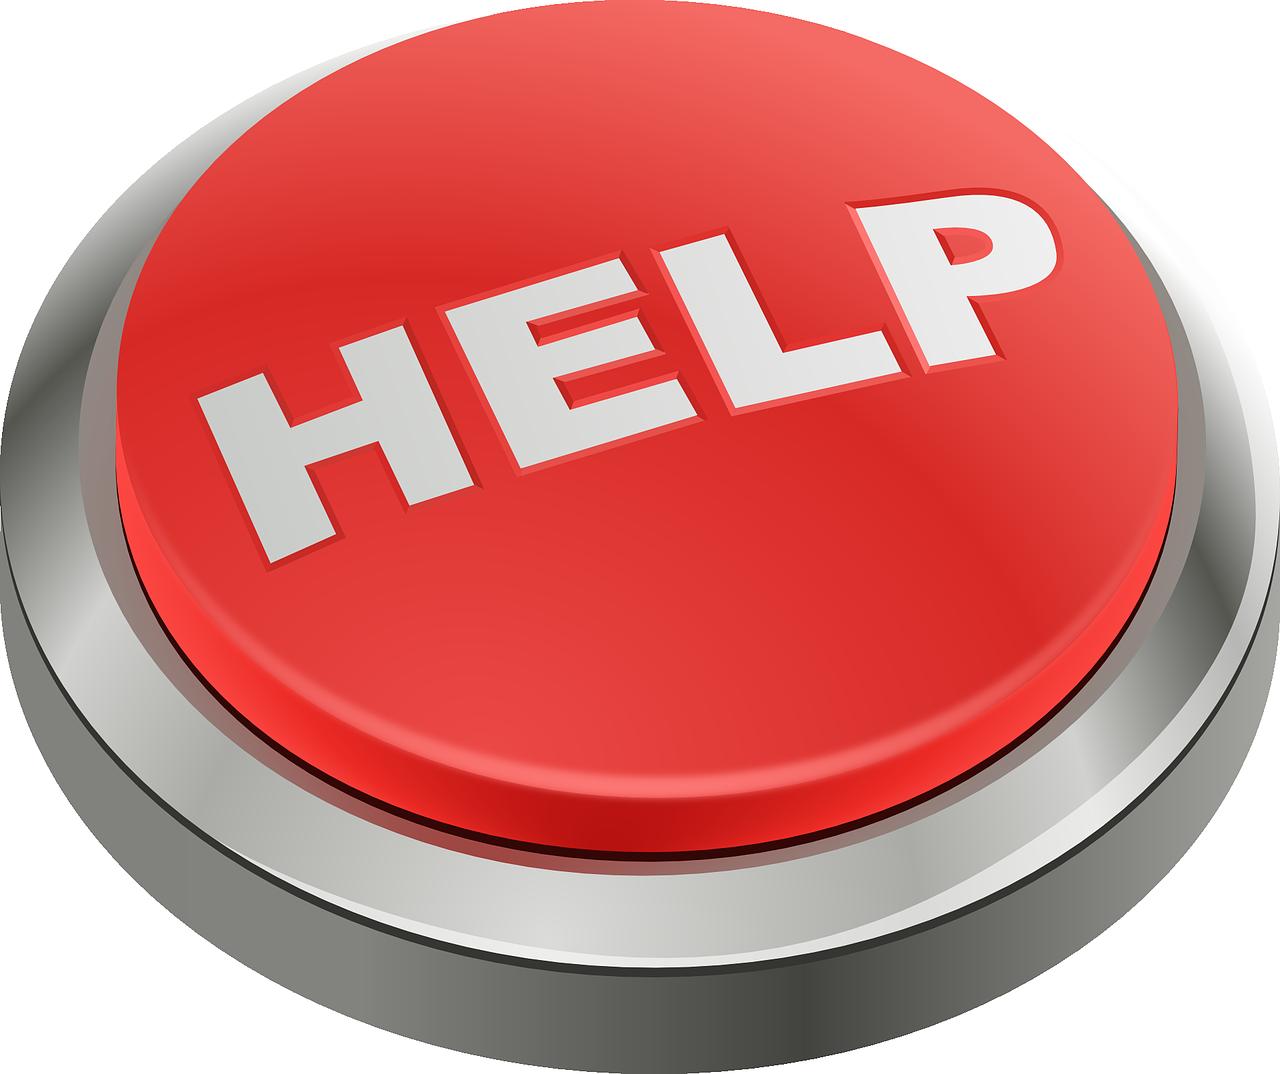 Please clipart help me  Business Solutions Help please!